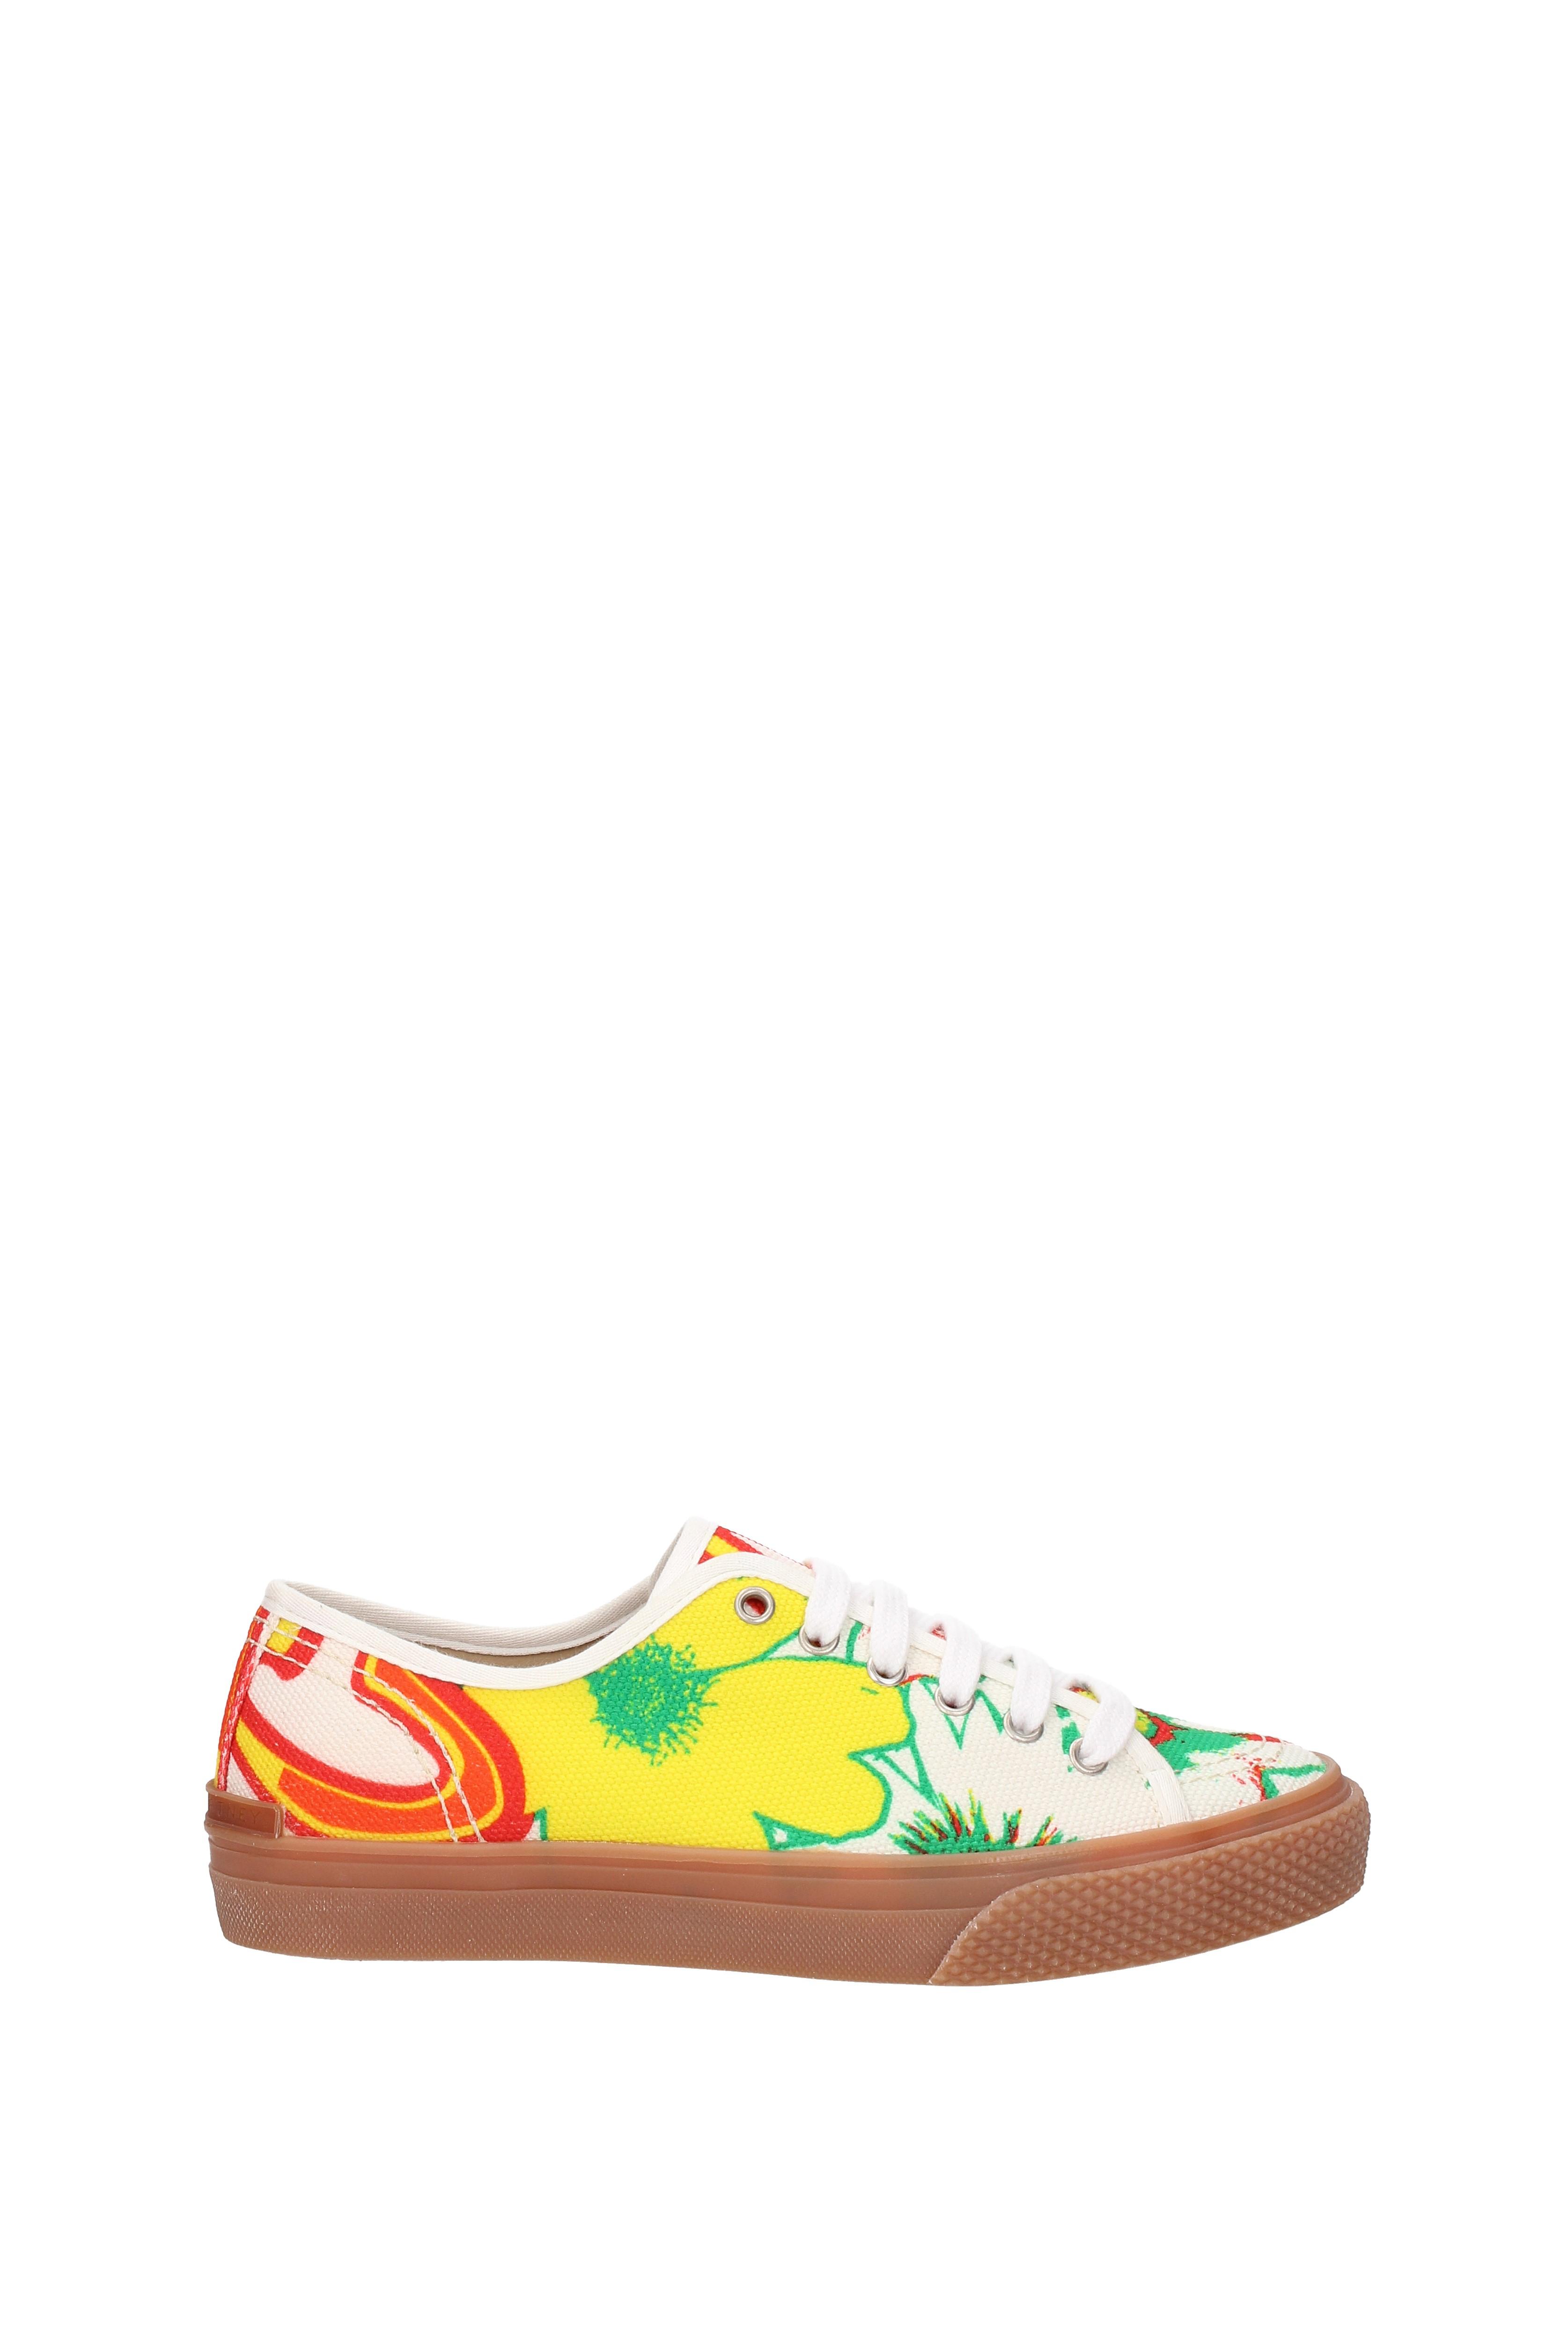 Sneakers-Stella-McCartney-Herren-Stoff-460677W1BI2